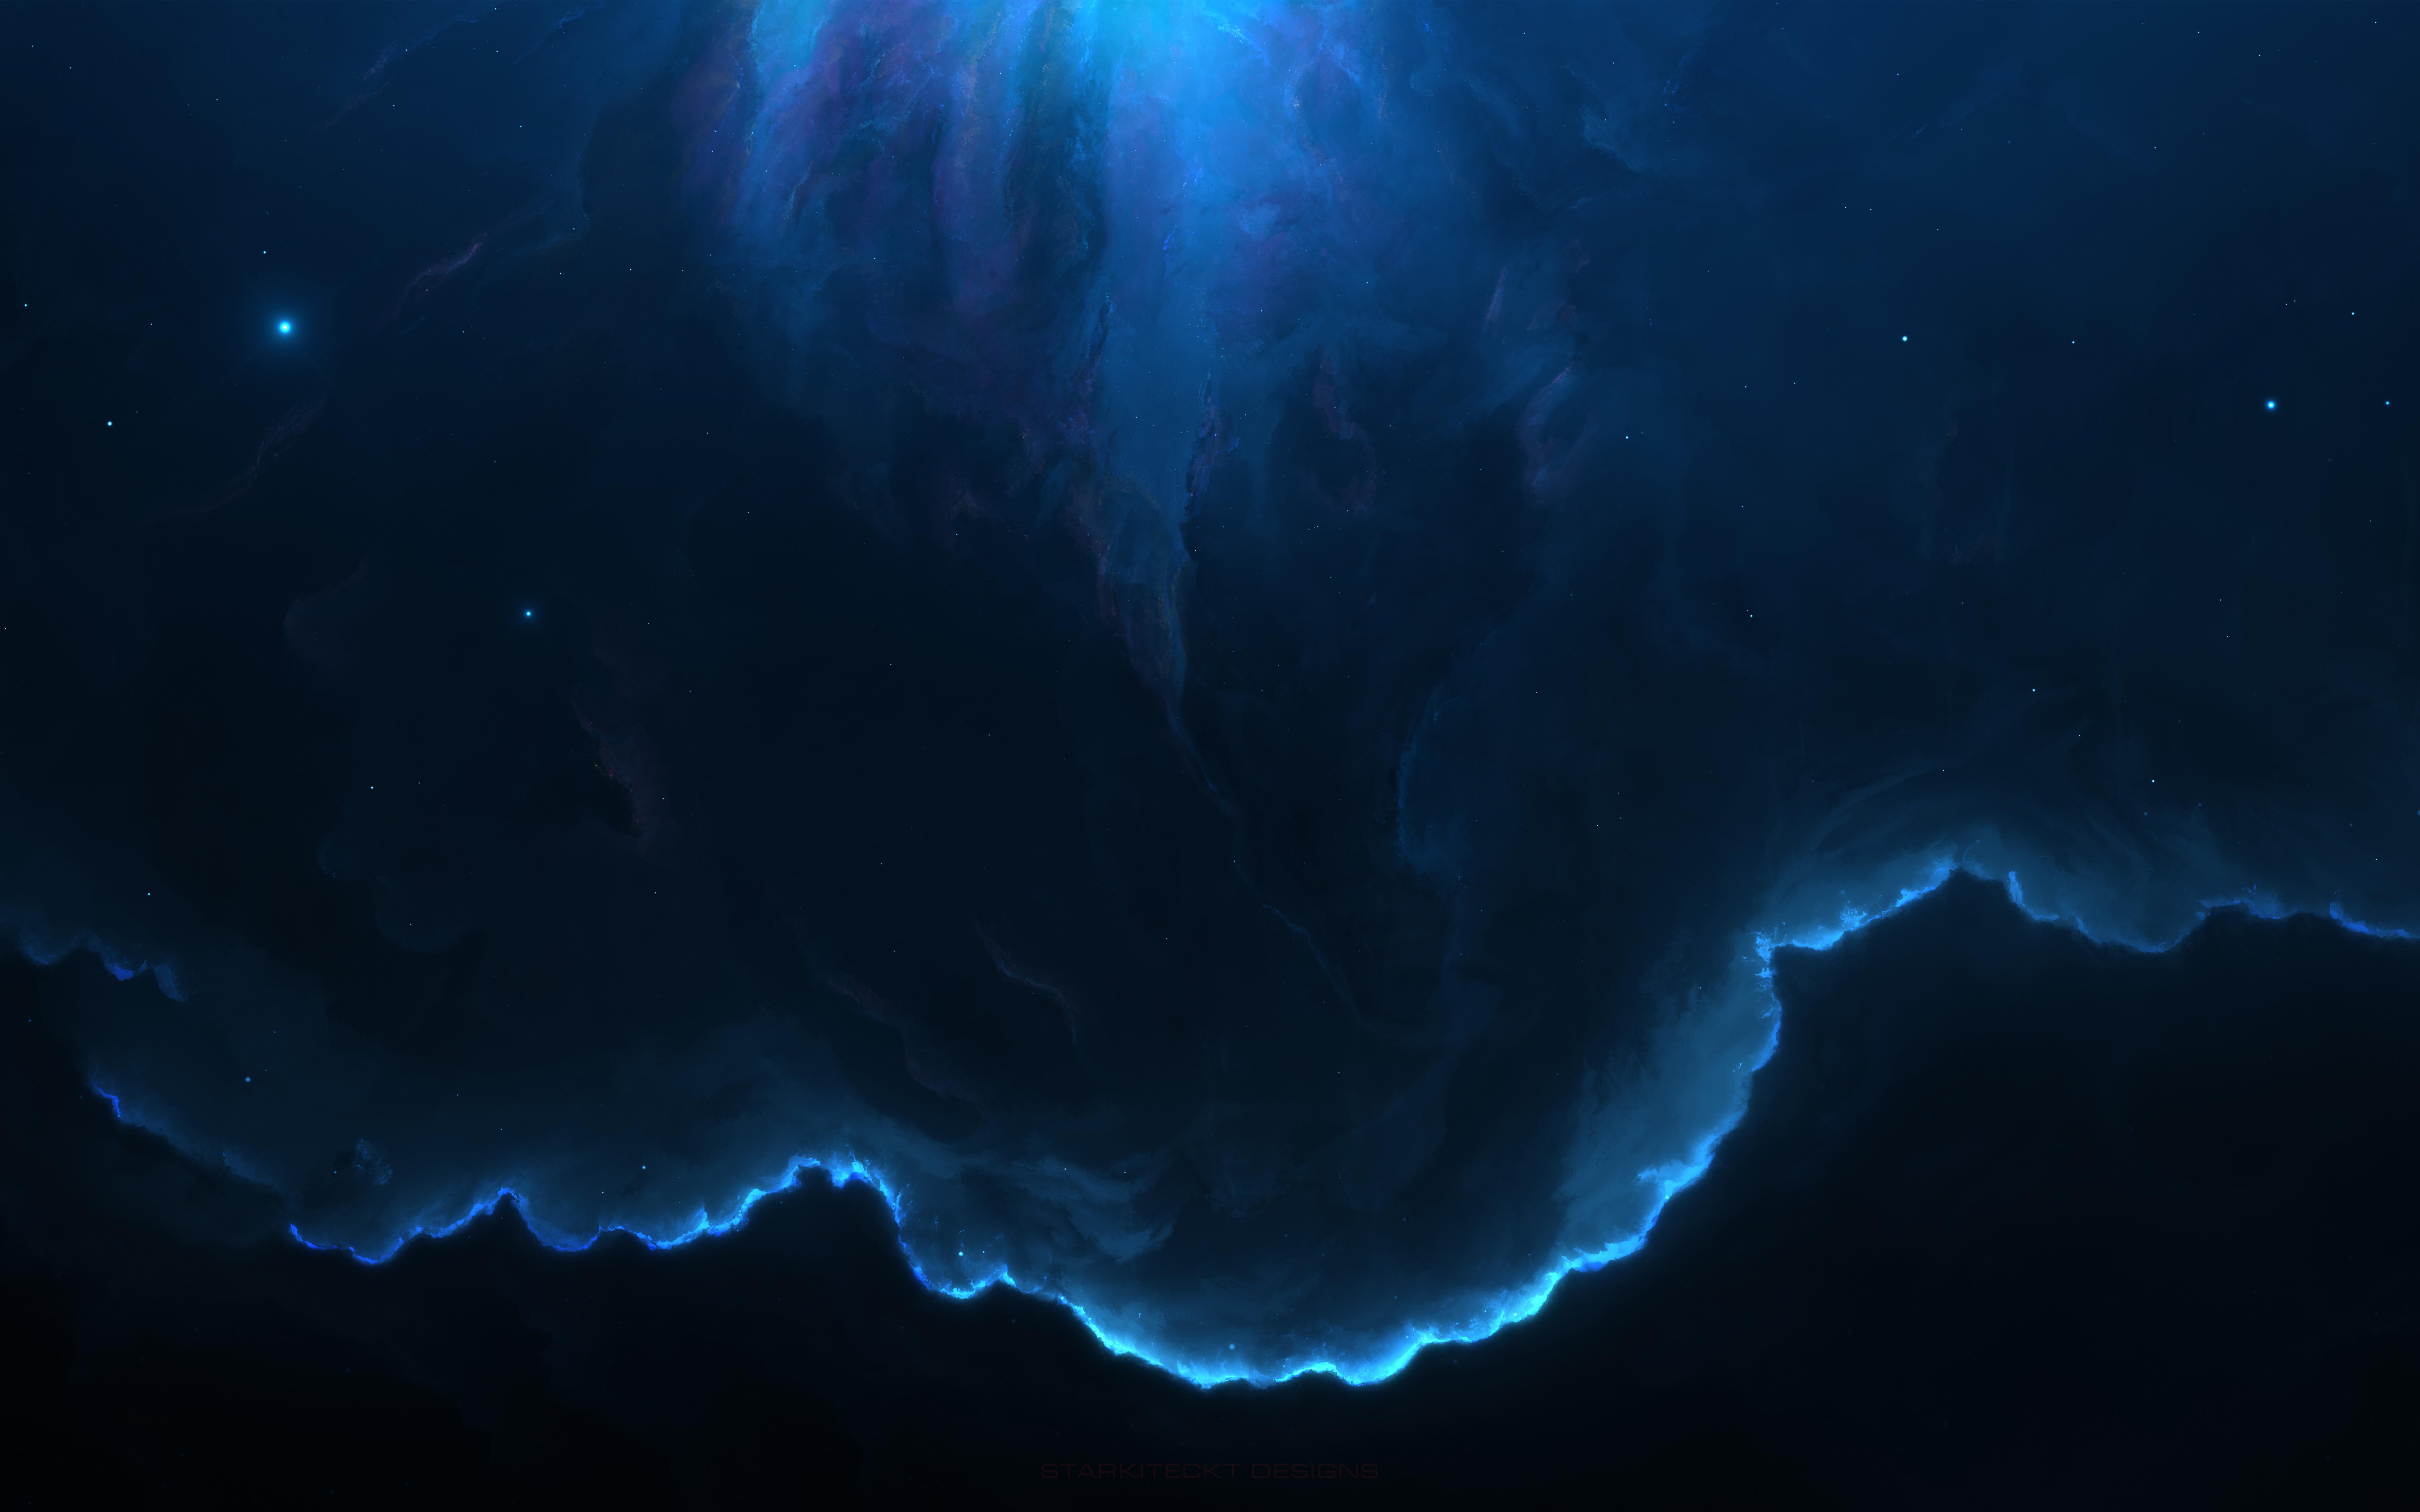 Space wallpapers photos and desktop backgrounds up to 8k - 8k desktop backgrounds ...